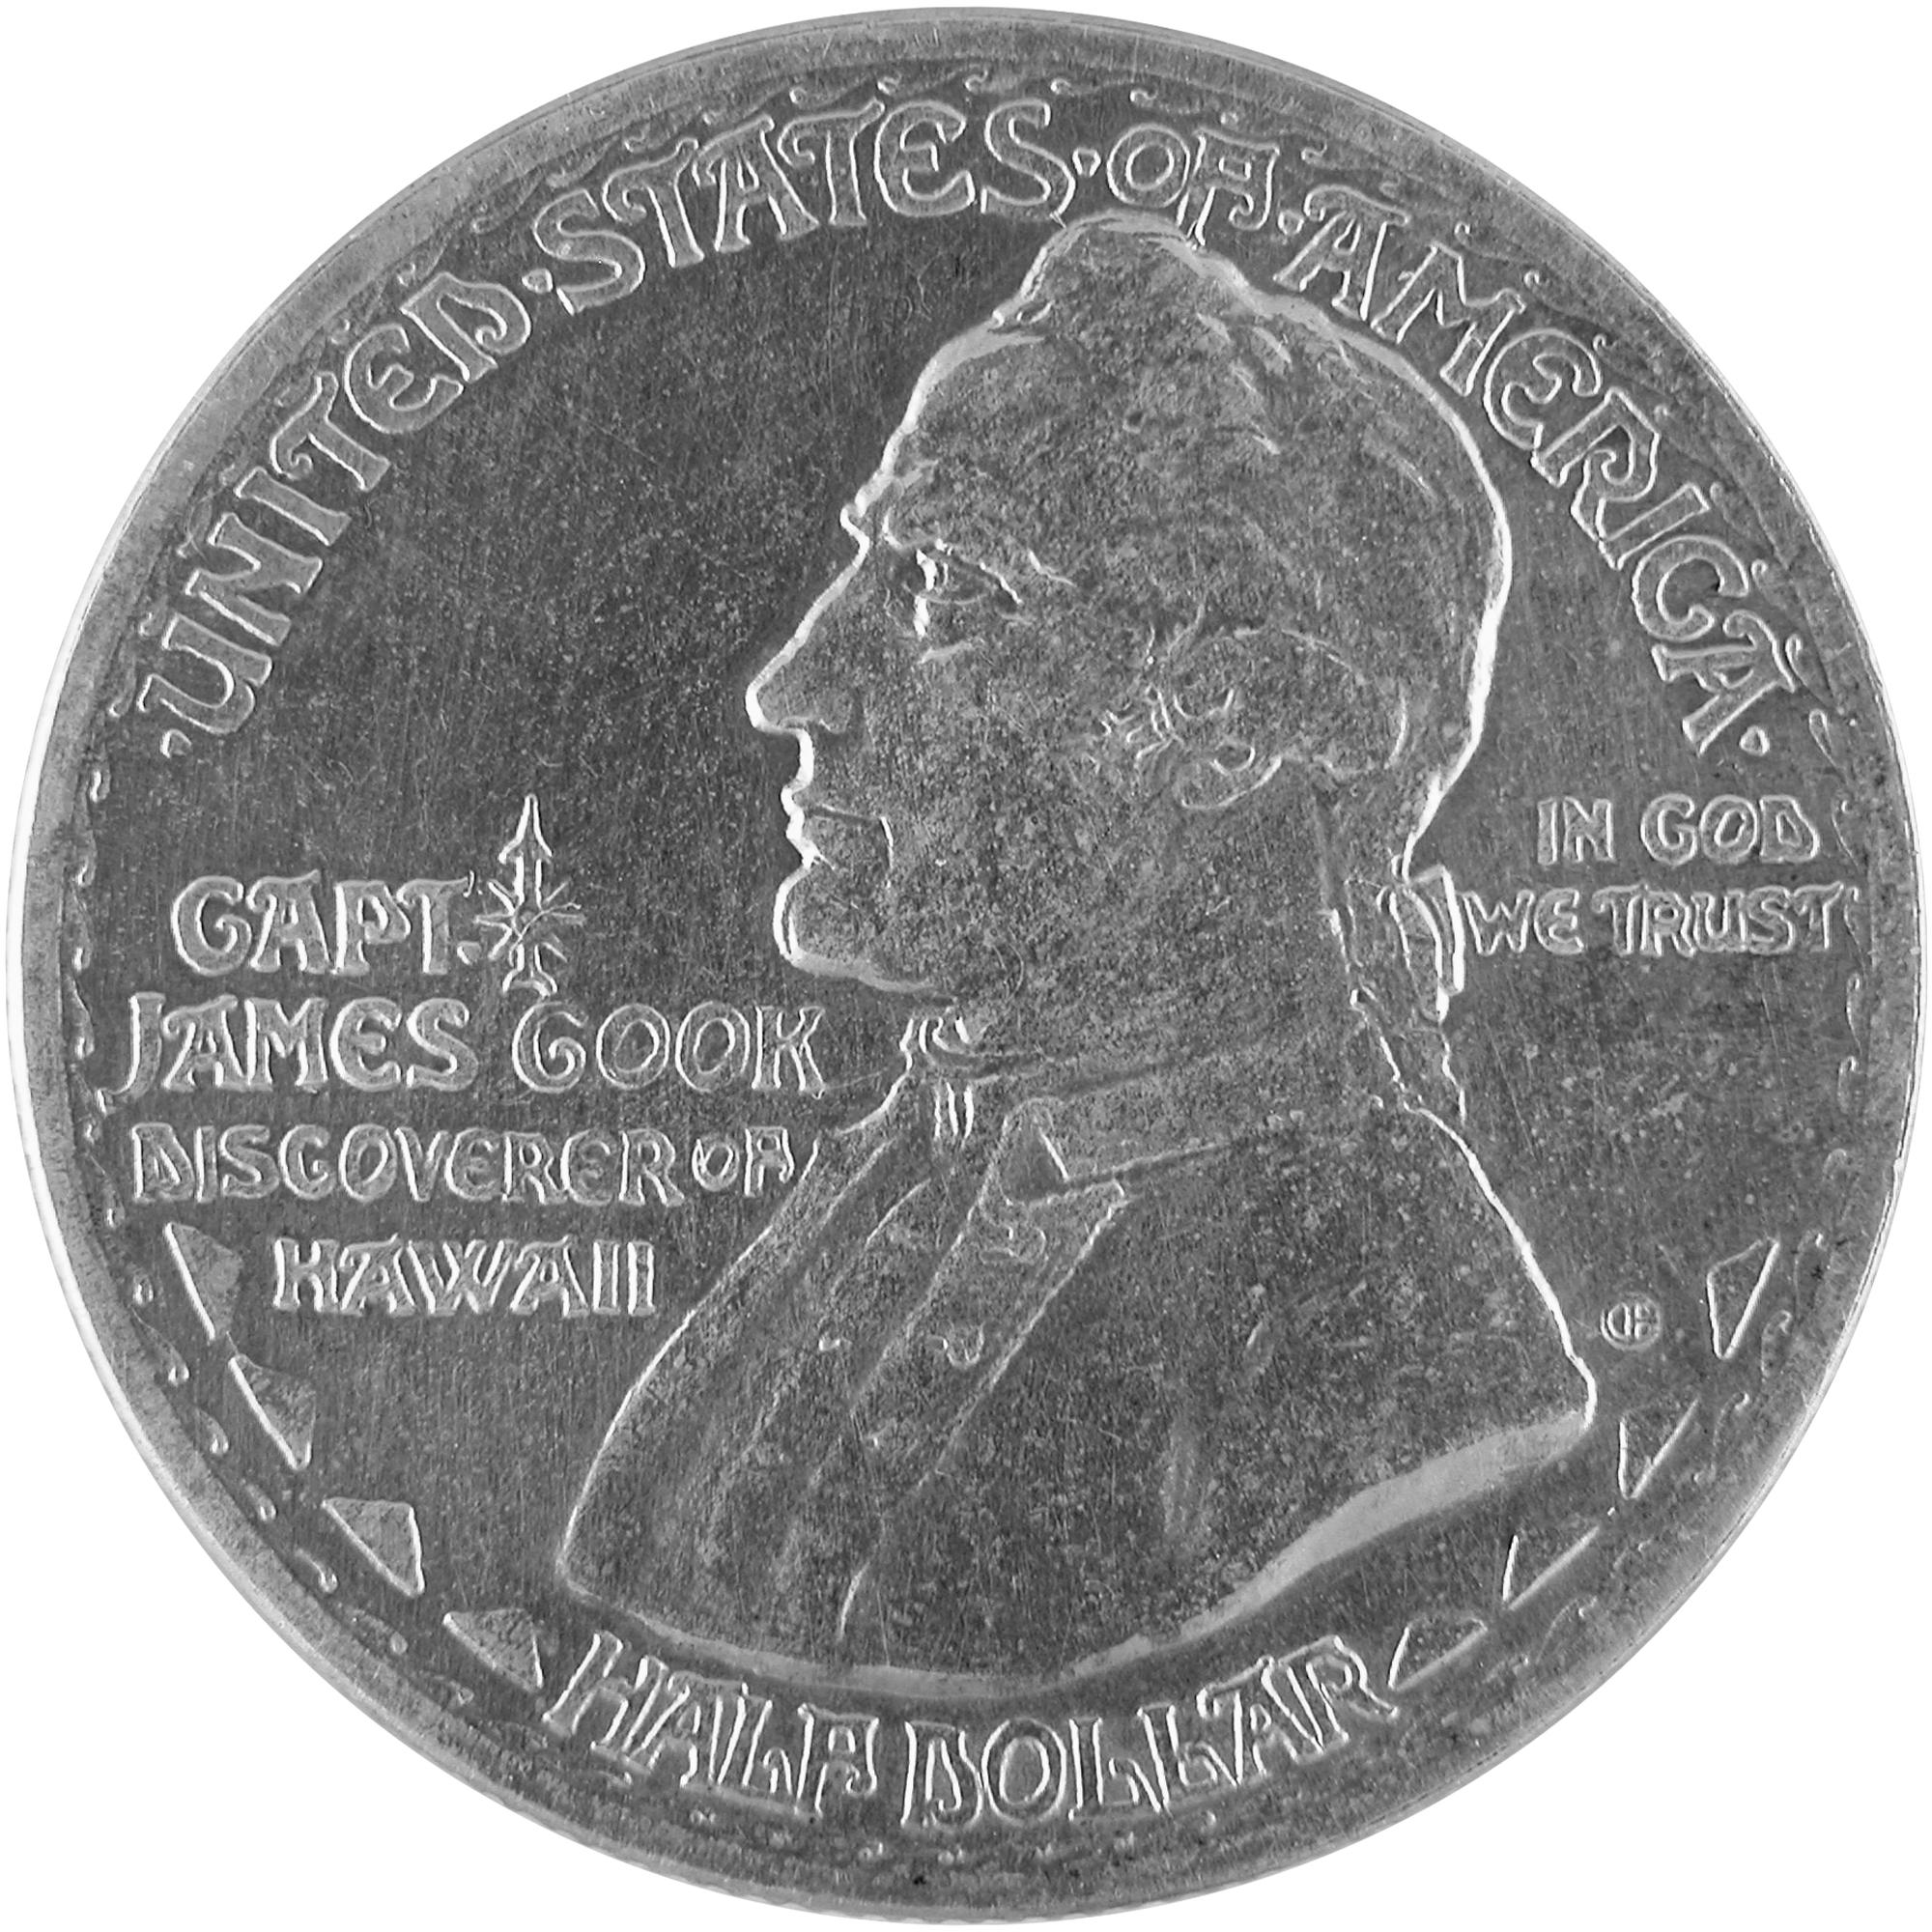 1928 Hawaiian Sesquicentennial Commemorative Silver Half Dollar Coin Obverse